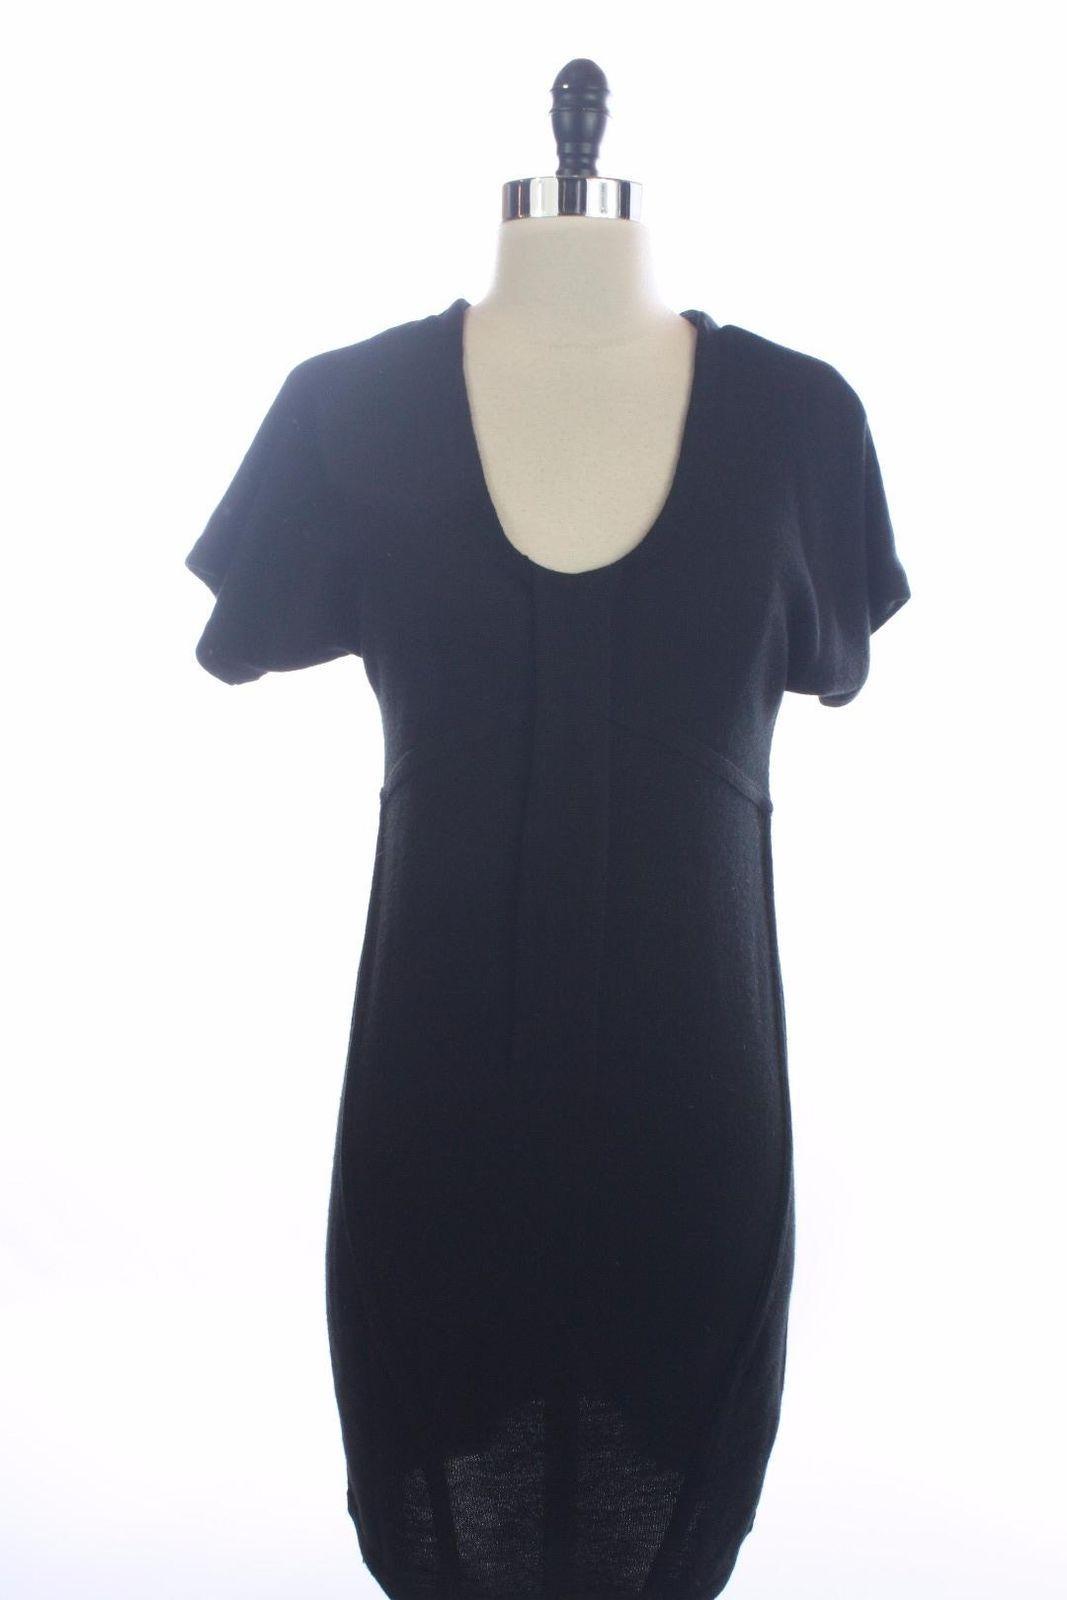 a34e1f082497c2 Awesome Amazing NWT New ANN TAYLOR LOFT Black Merino Wool SHORT SLEEVE  SWEATER DRESS Size XS